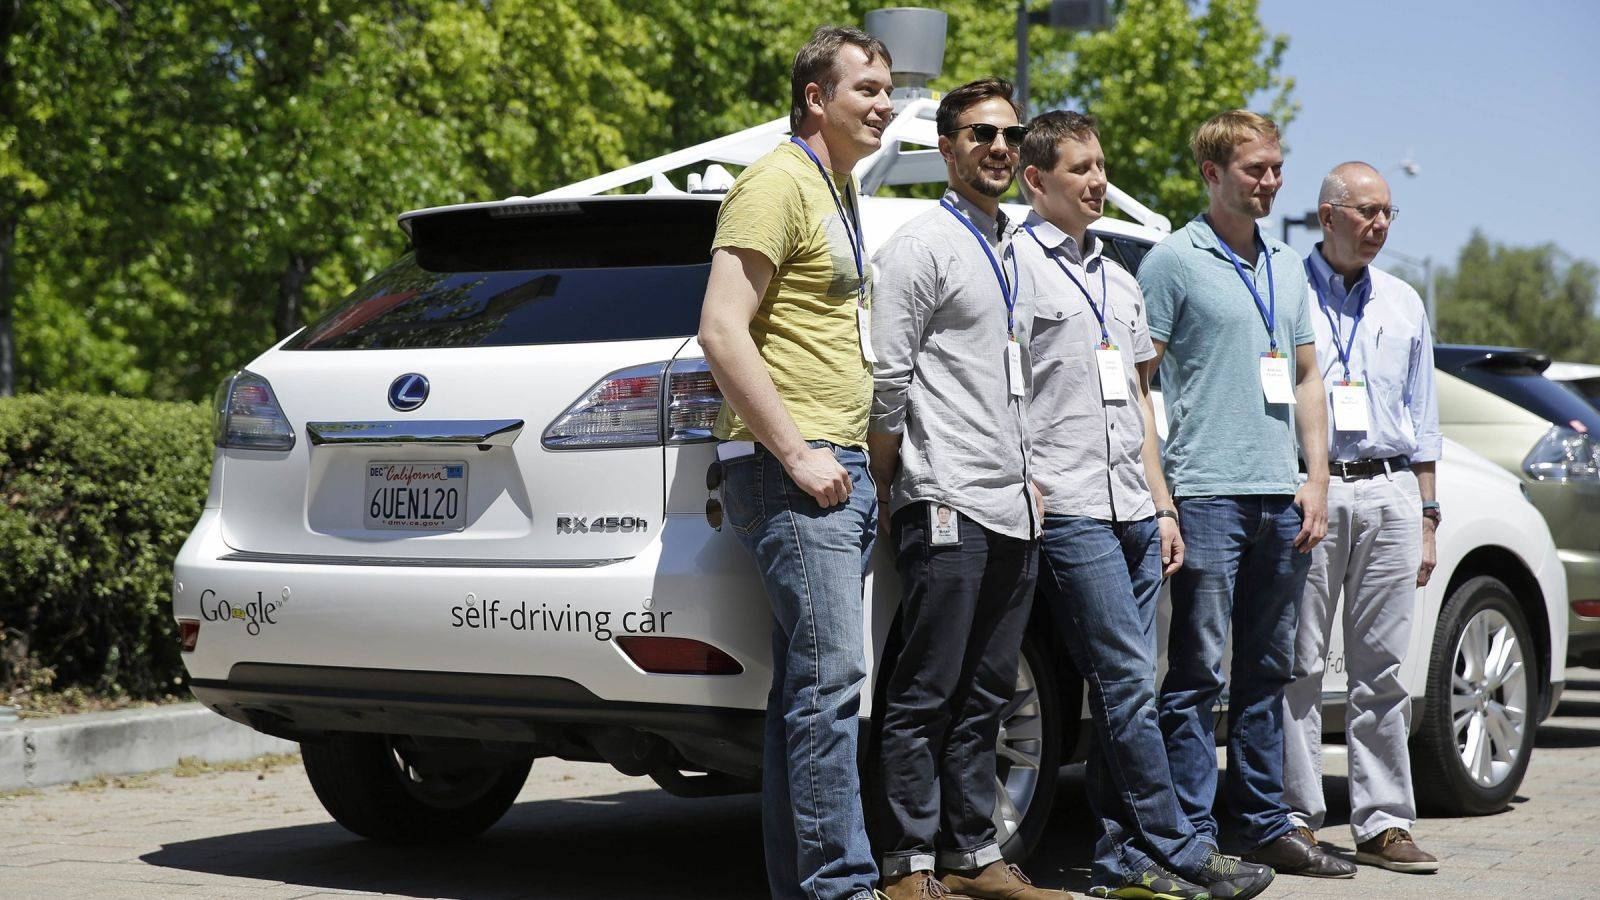 Google 自动驾驶创始团队